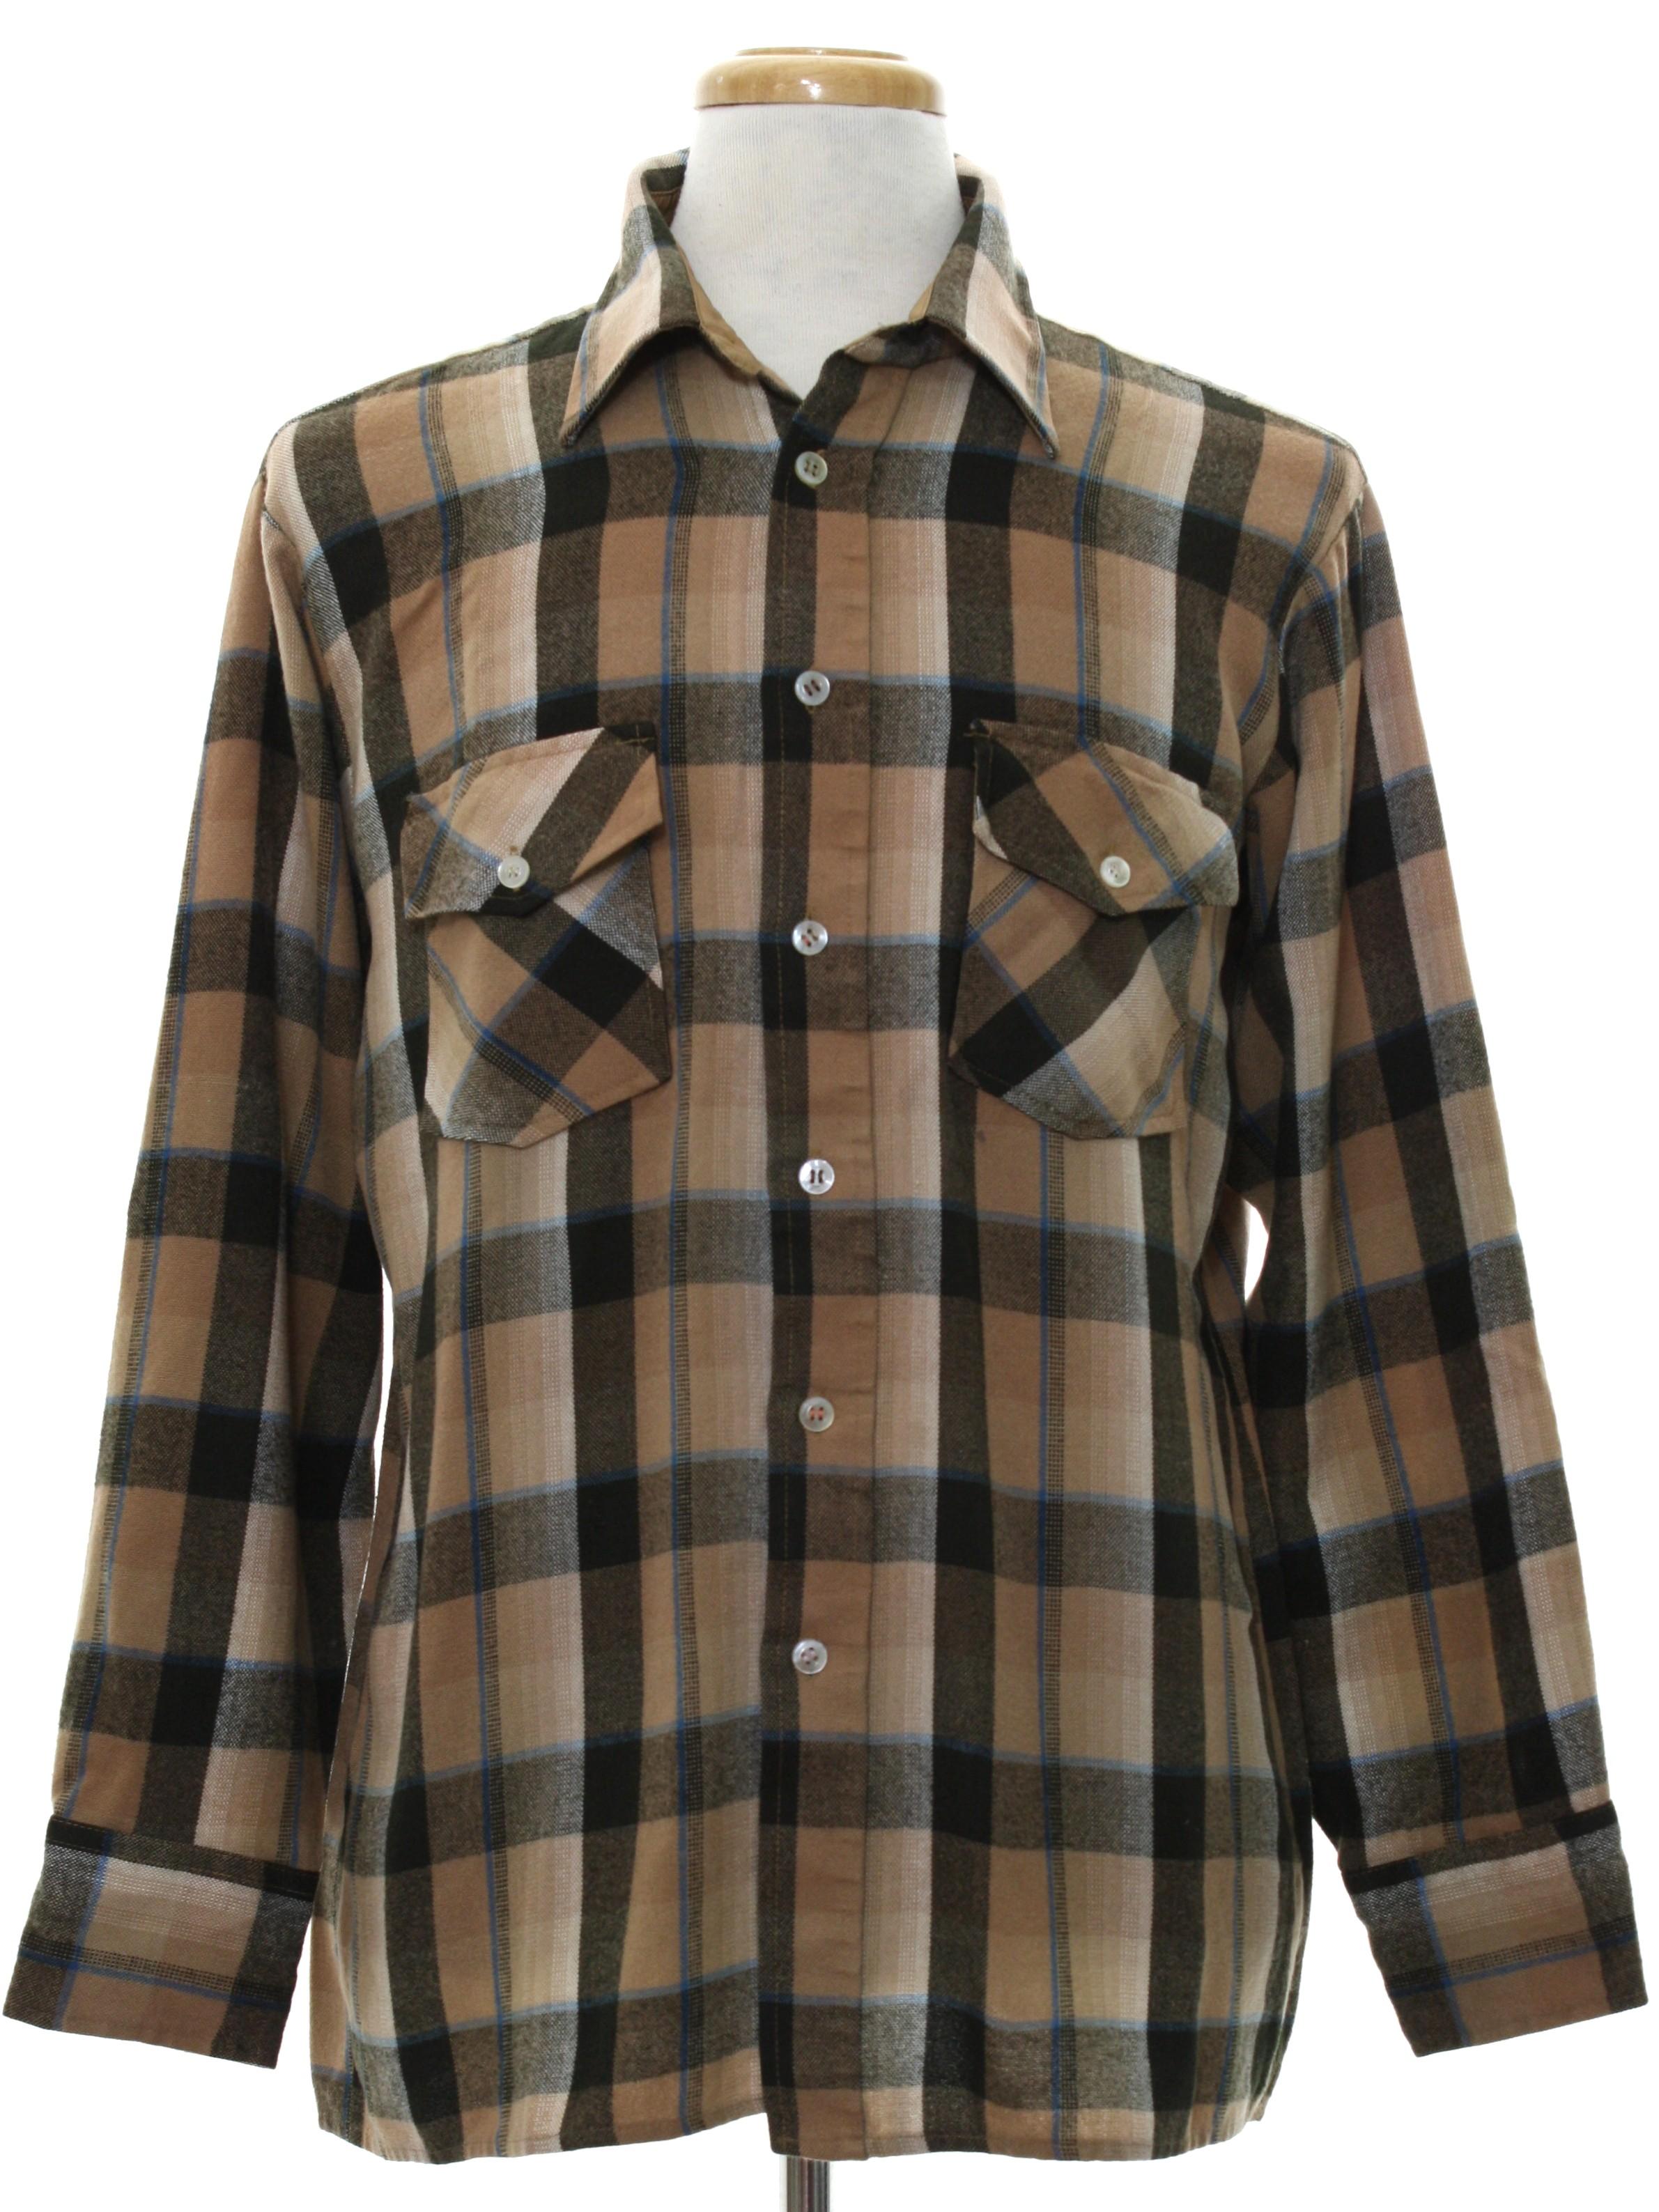 Seventies vintage shirt late 70s or early 80s van heusen for Van heusen plaid shirts